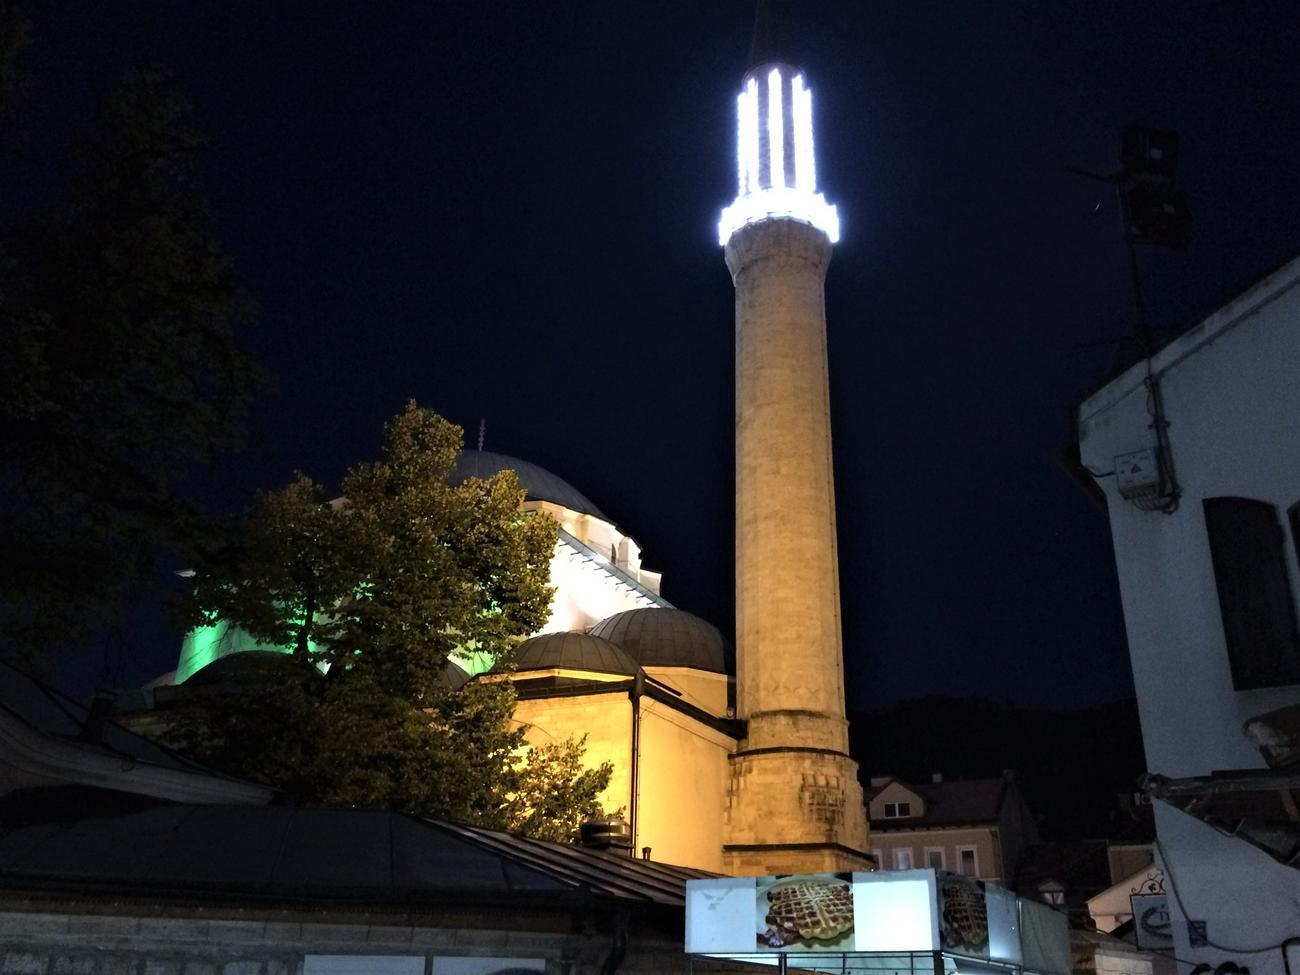 Gazi Husrev-bey Mosque at night